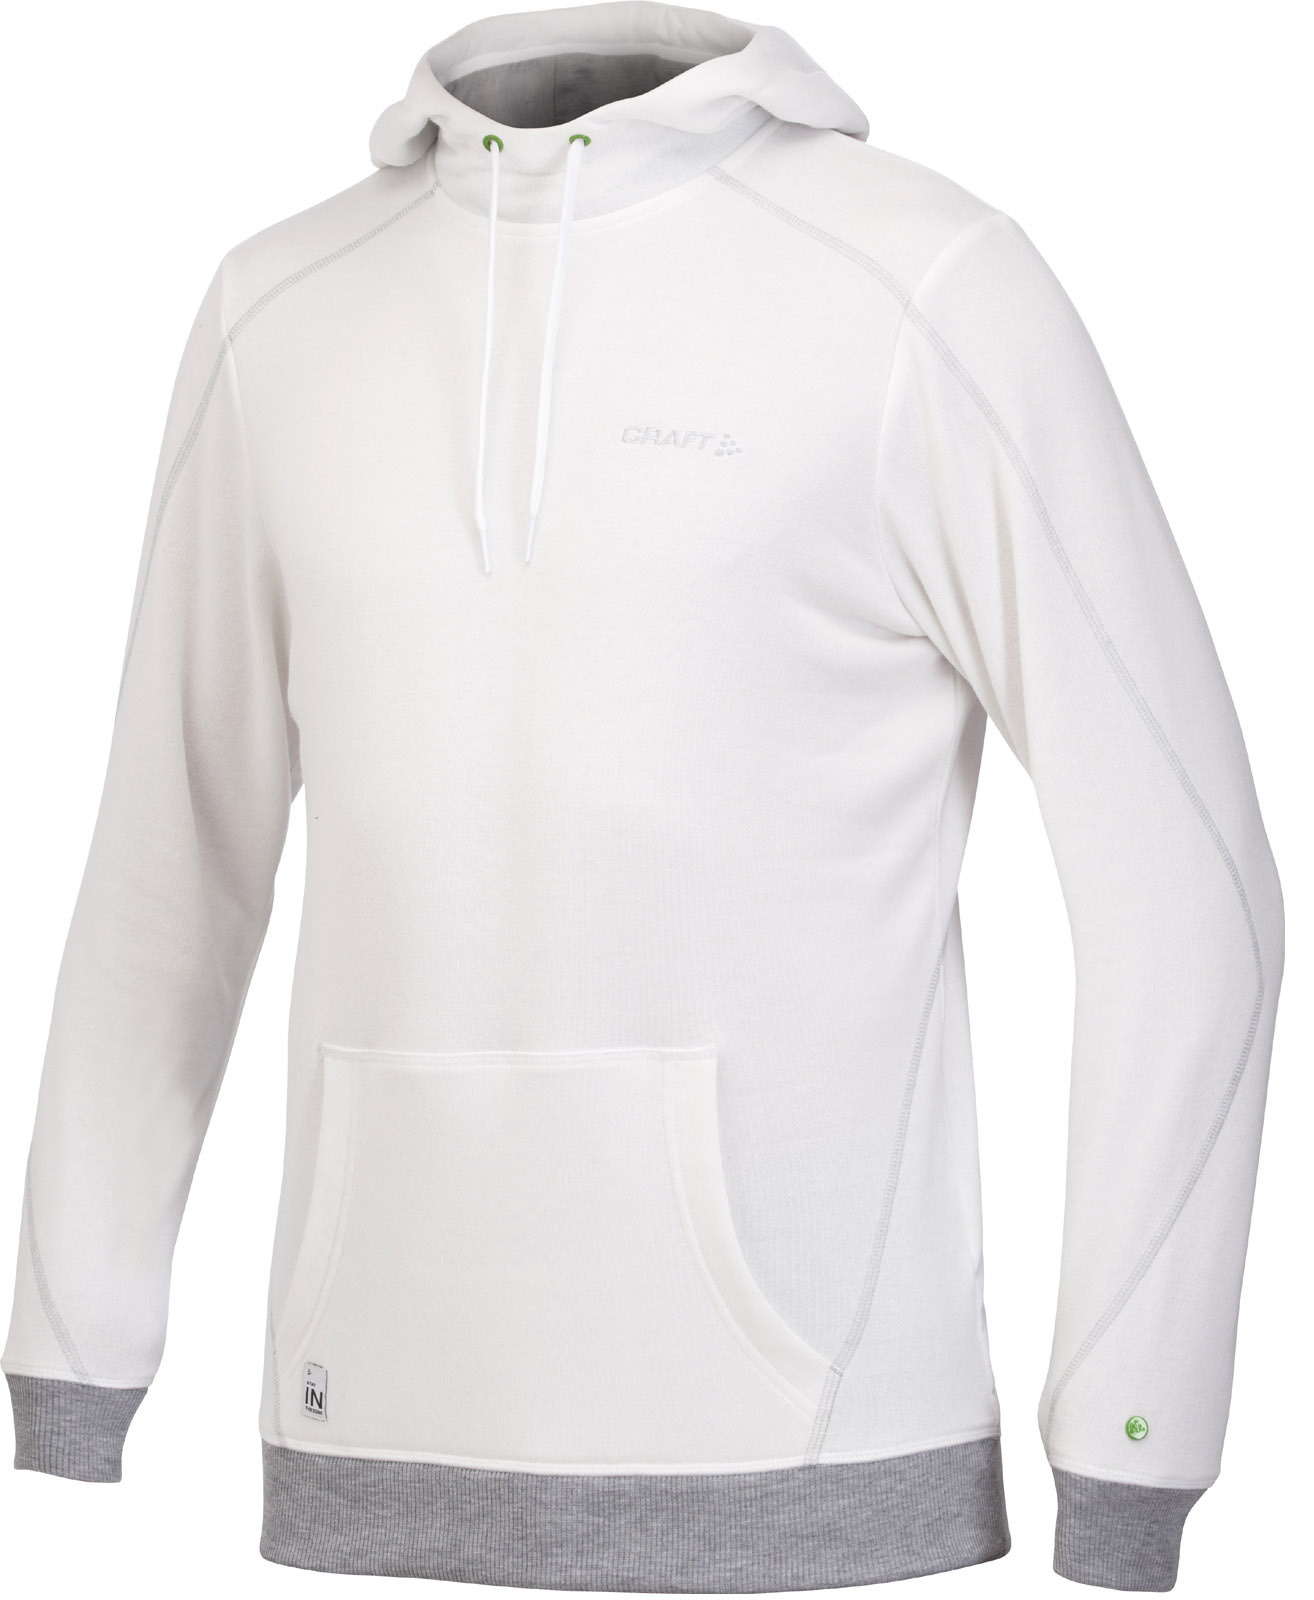 Мужская толстовка Craft In the Zone Hood white (1902628-2900)